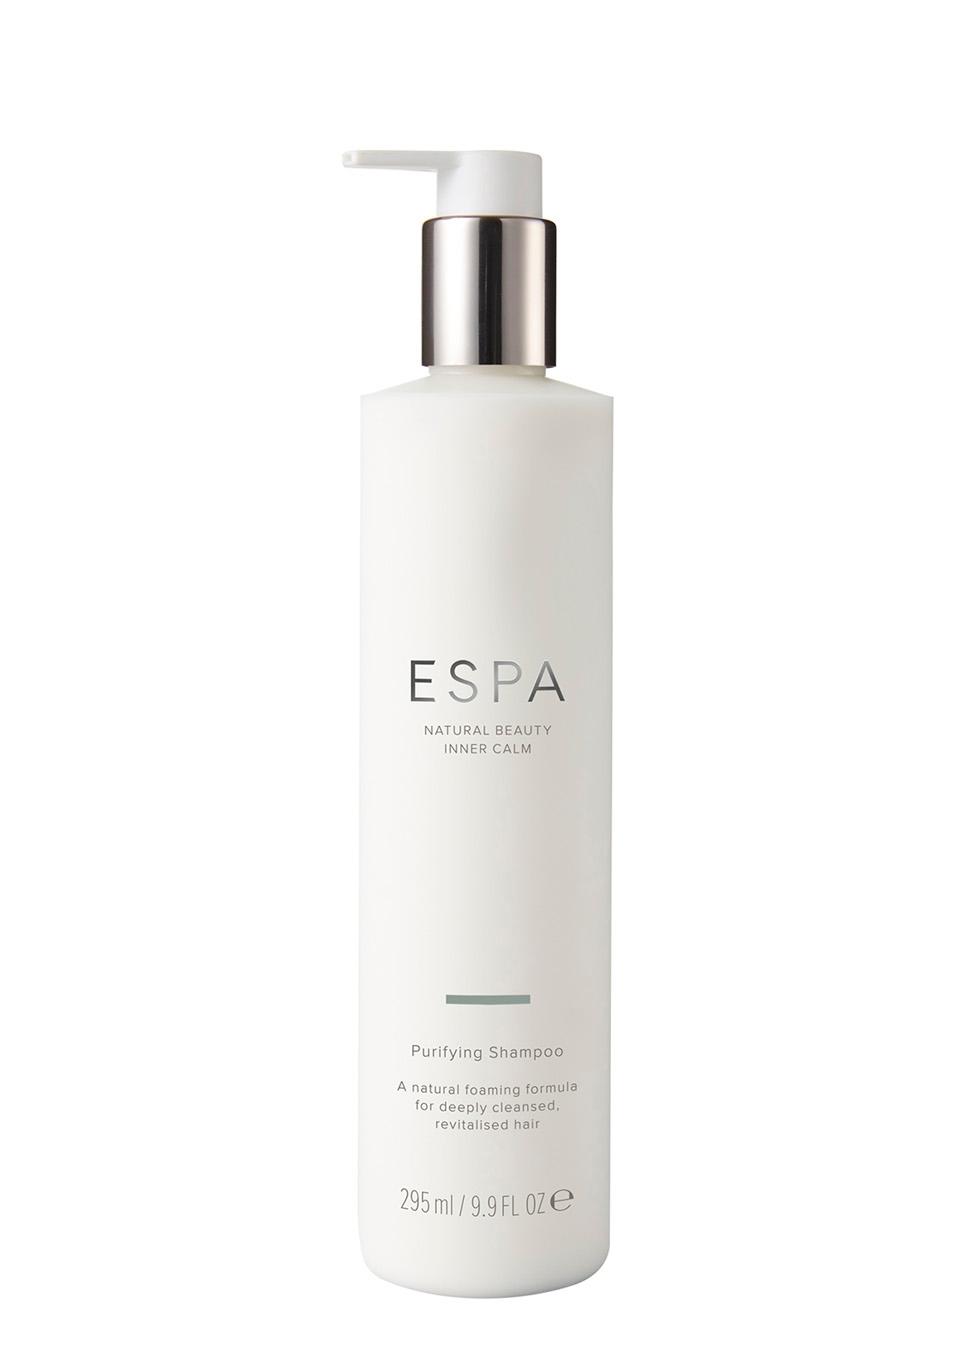 Purifying Shampoo 295ml